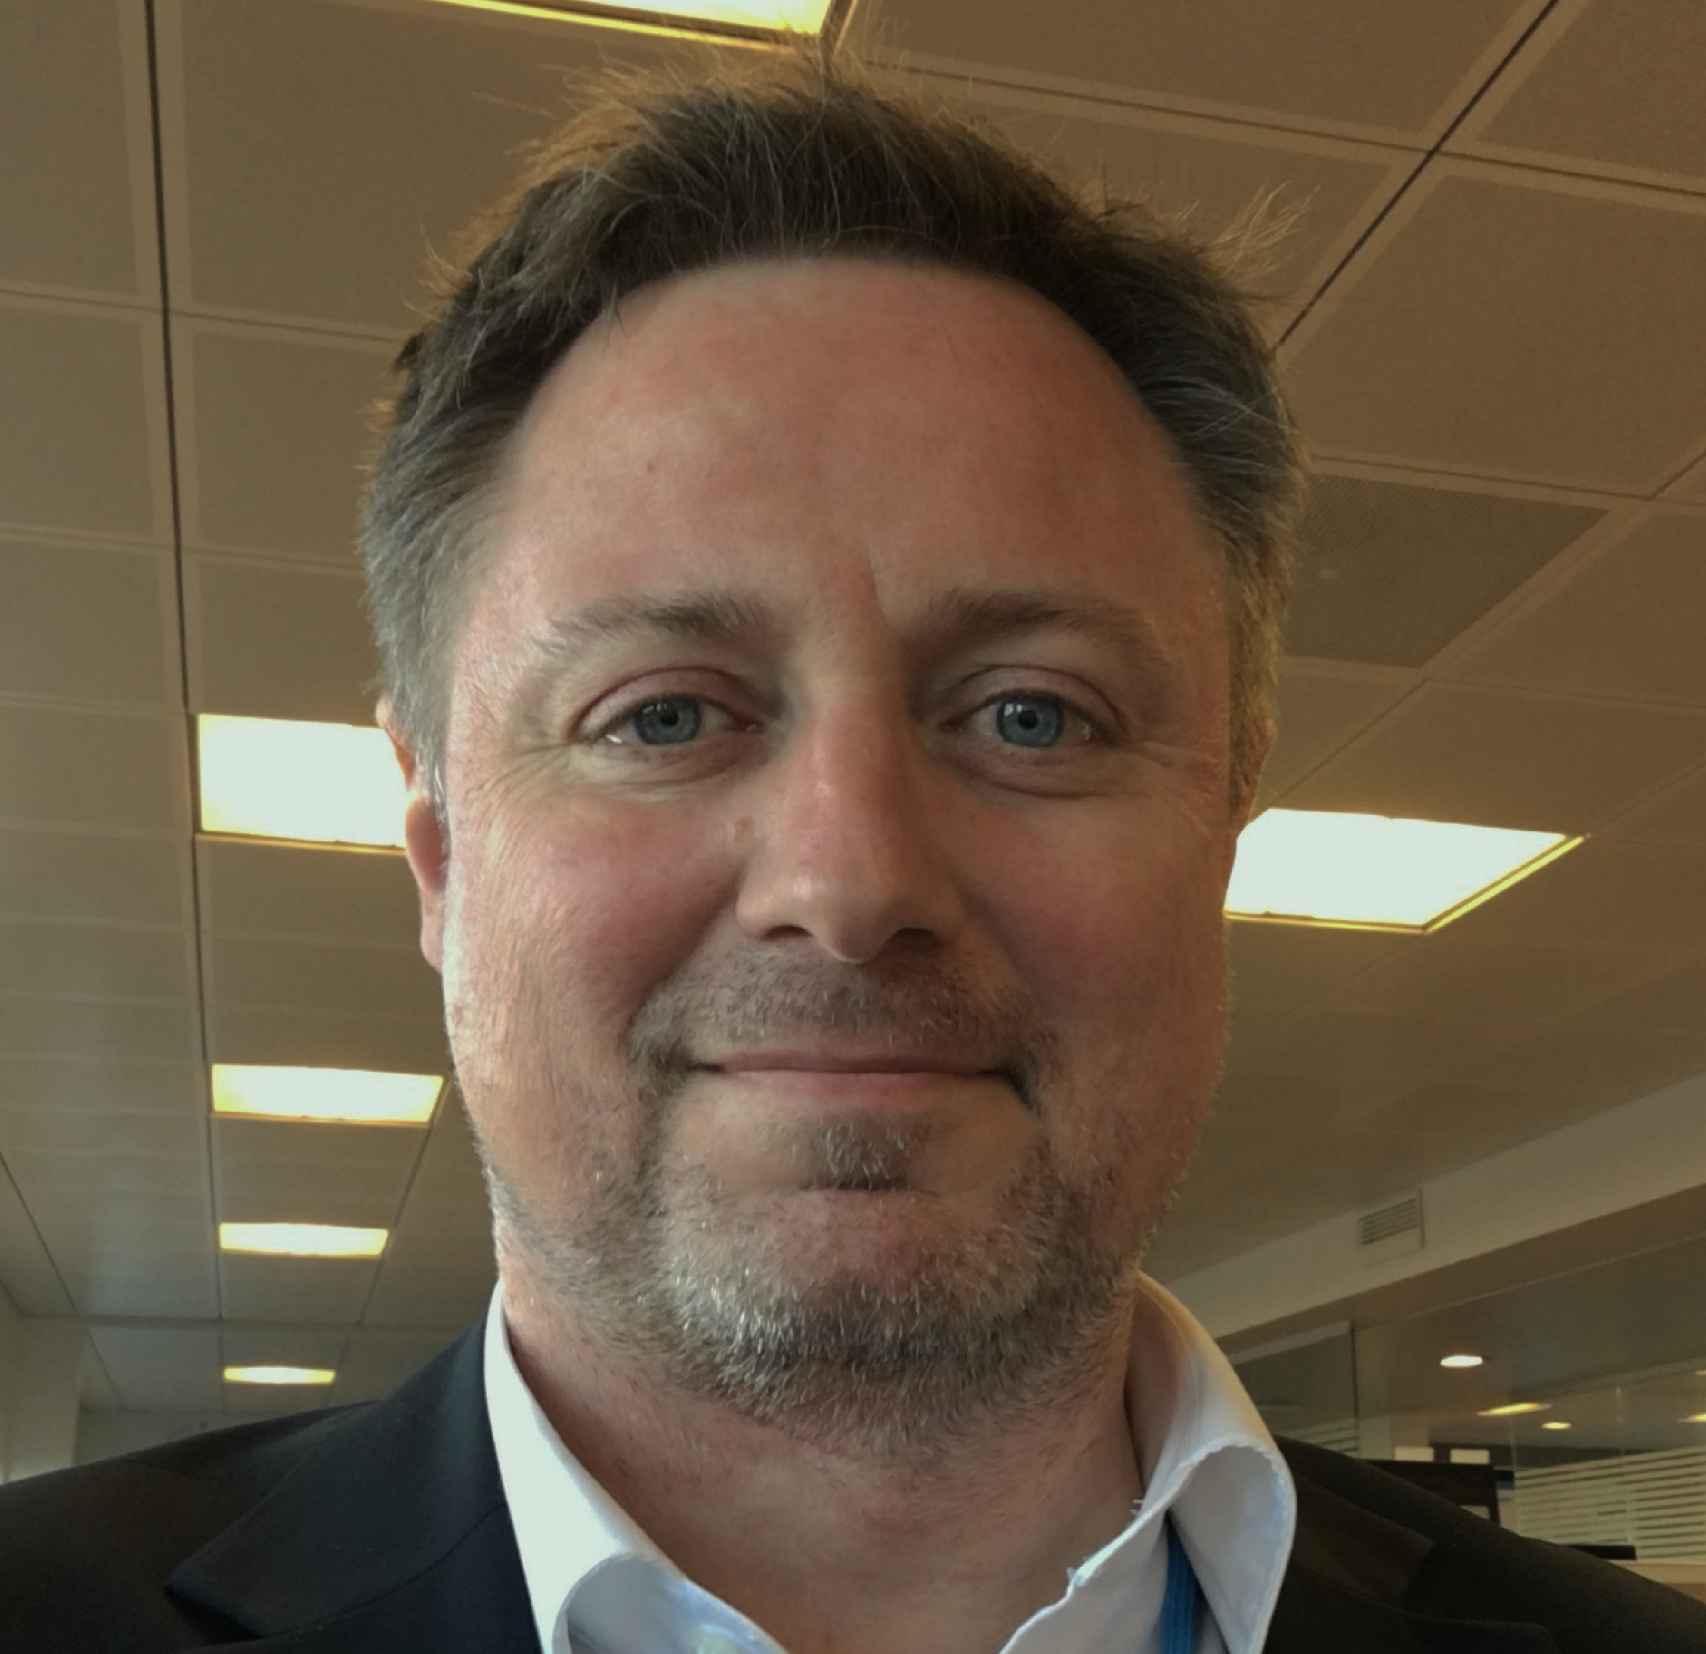 Flemming-Sørensen, nuevo vicepresidente de LevelTen